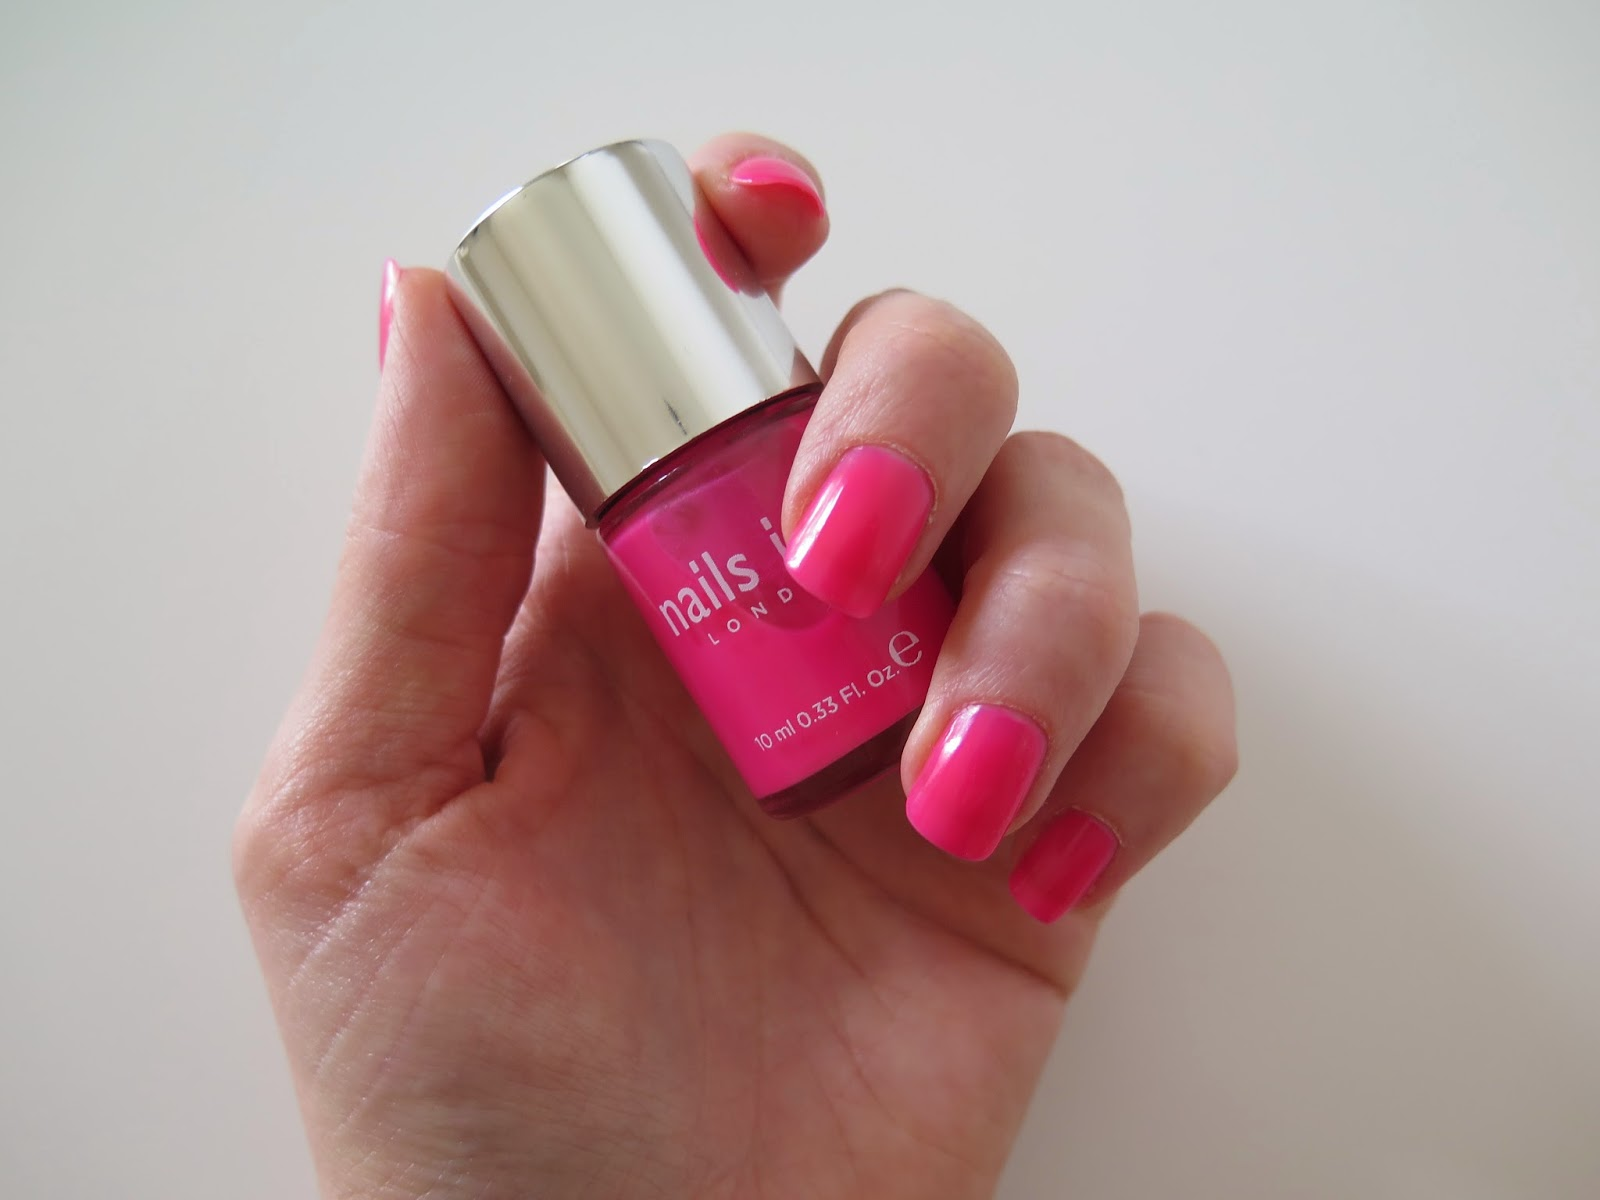 Nails Inc Notting Hill Gate, nail polish